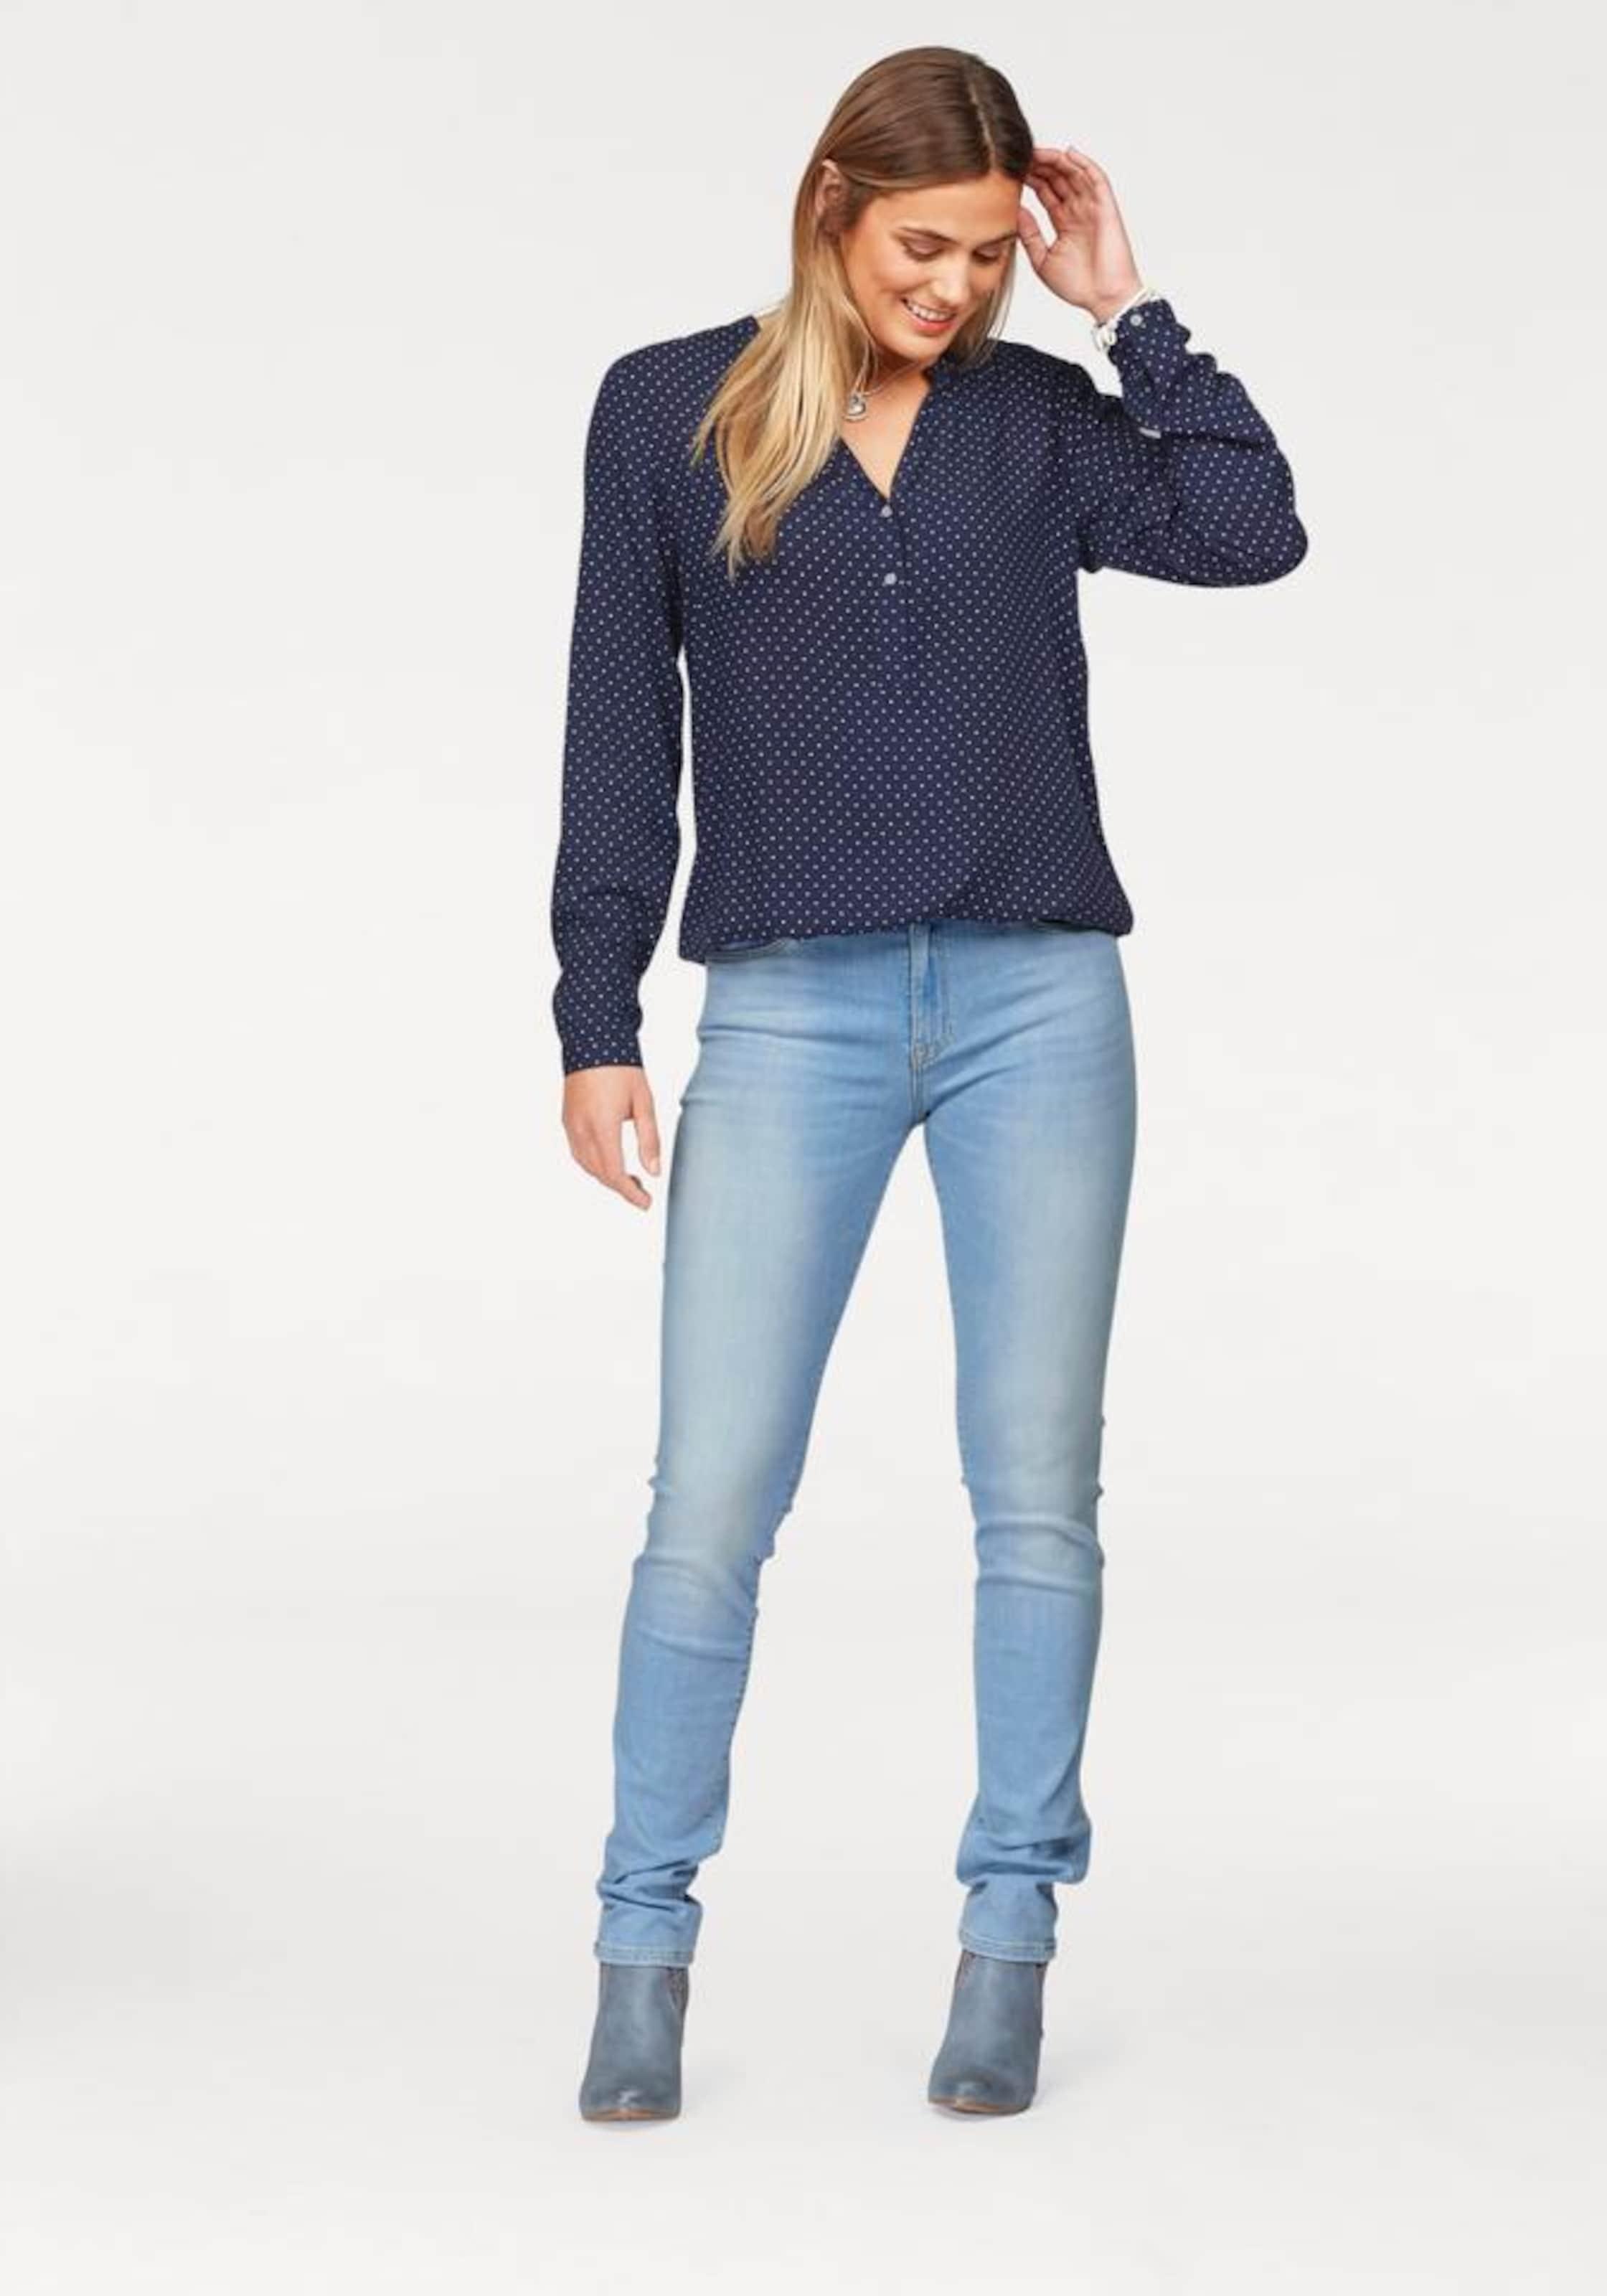 Cross Jeans Bluse Freies Verschiffen Neuestes d0TdUOQ